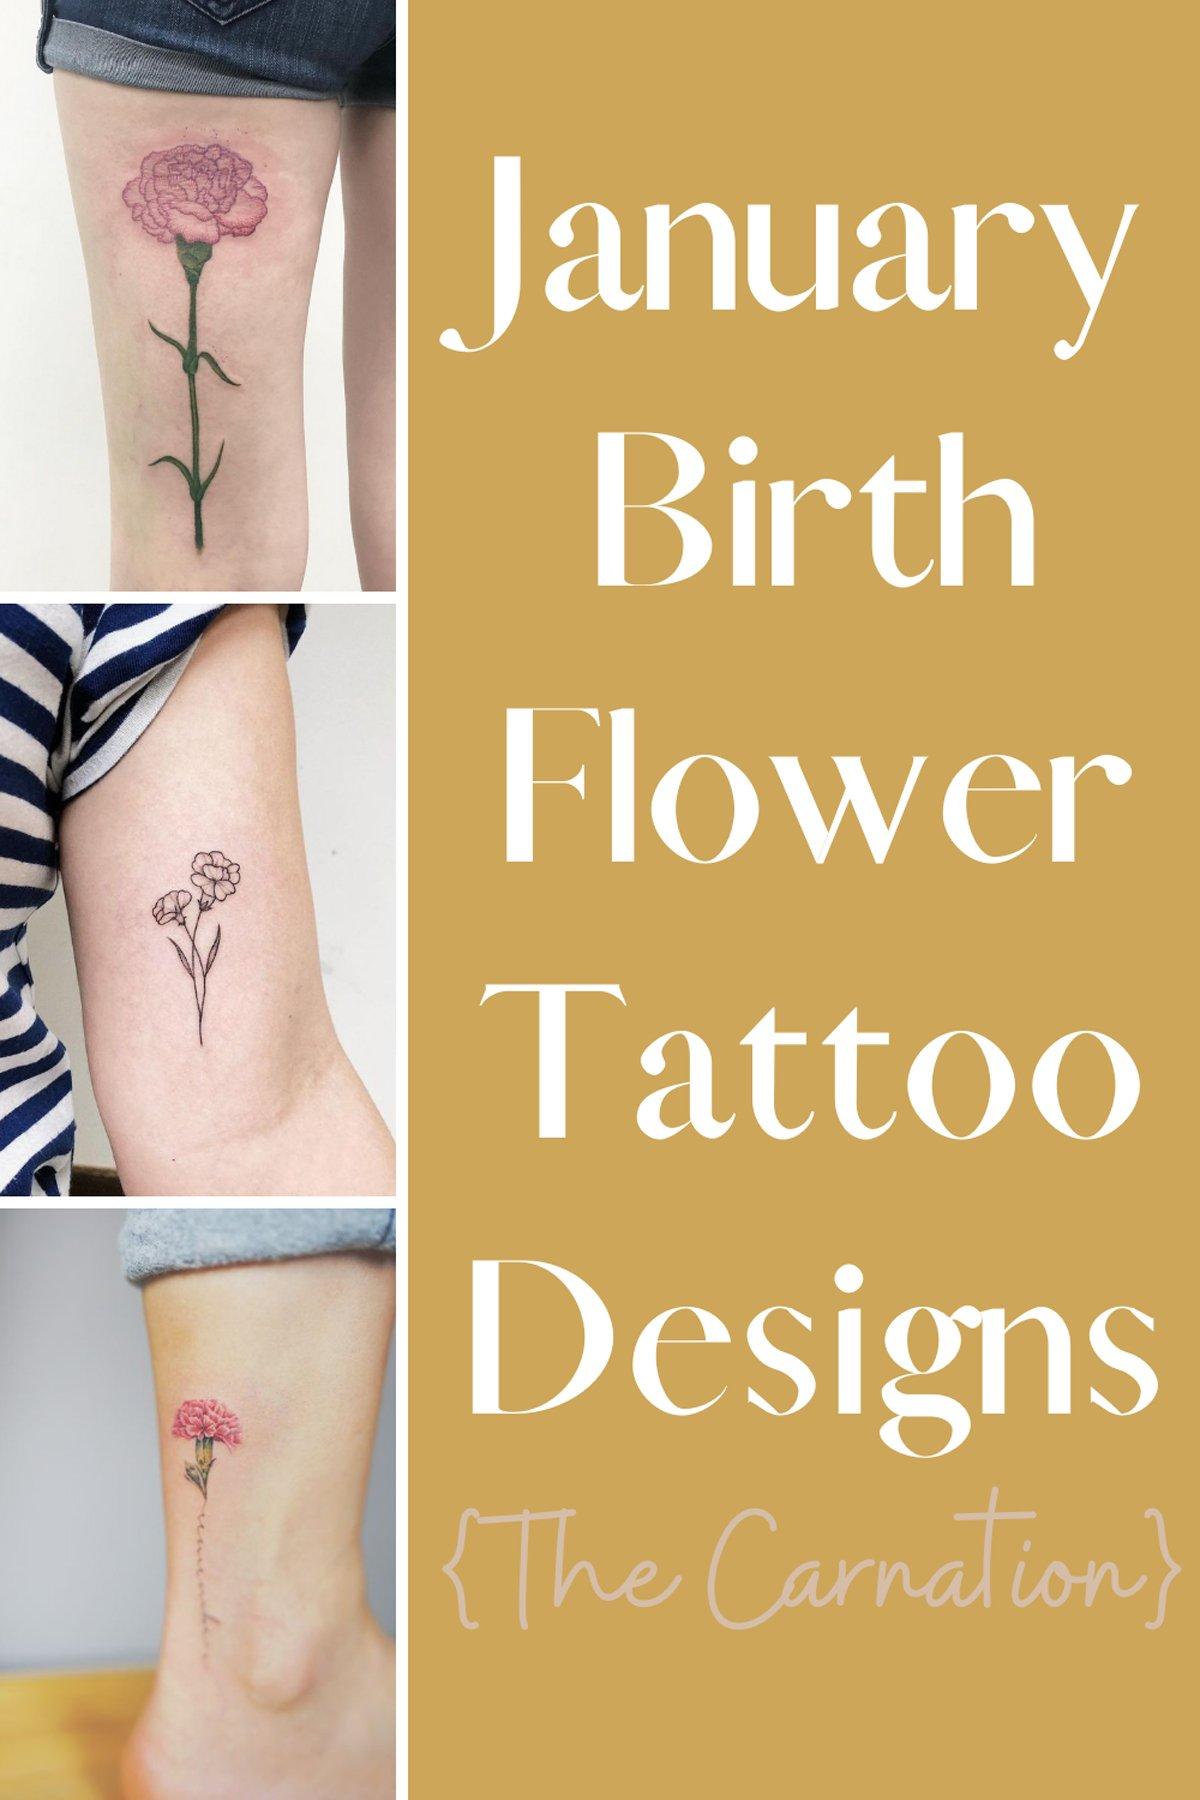 January Birth Flower Tattoo Designs